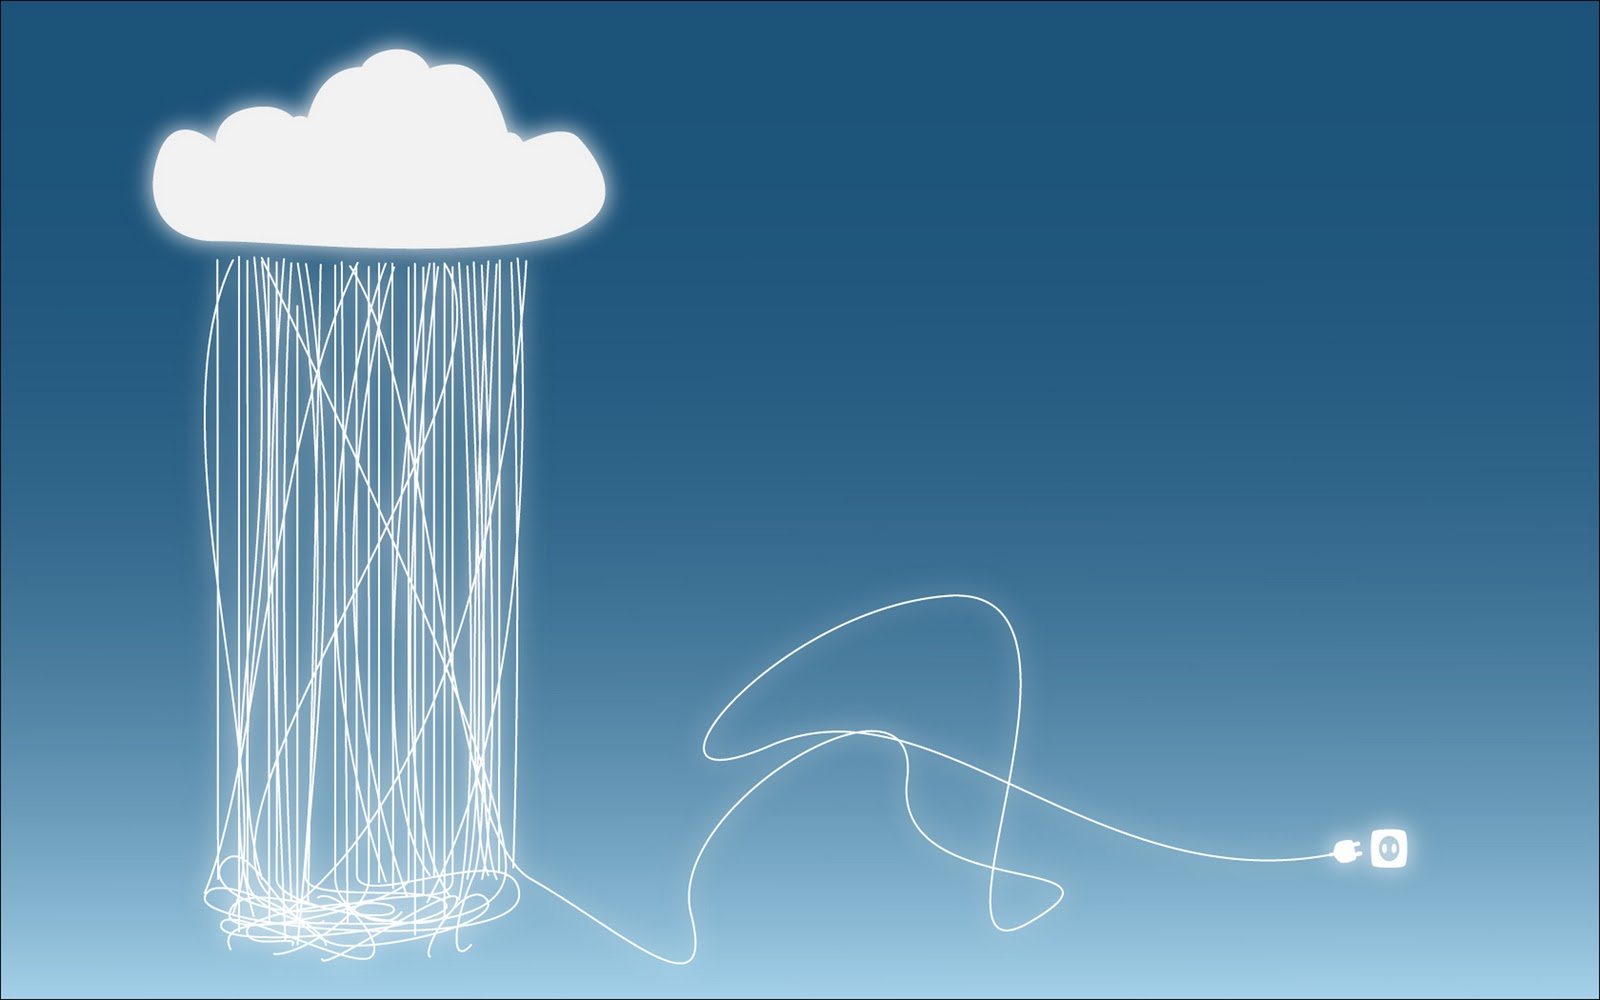 http://1.bp.blogspot.com/_14grgzfQGYA/TPlY3xvYTUI/AAAAAAAACaw/YZG4kgm4nZg/s1600/54-rain-energy-vector-hd-wallpaper-2560x1600.jpeg